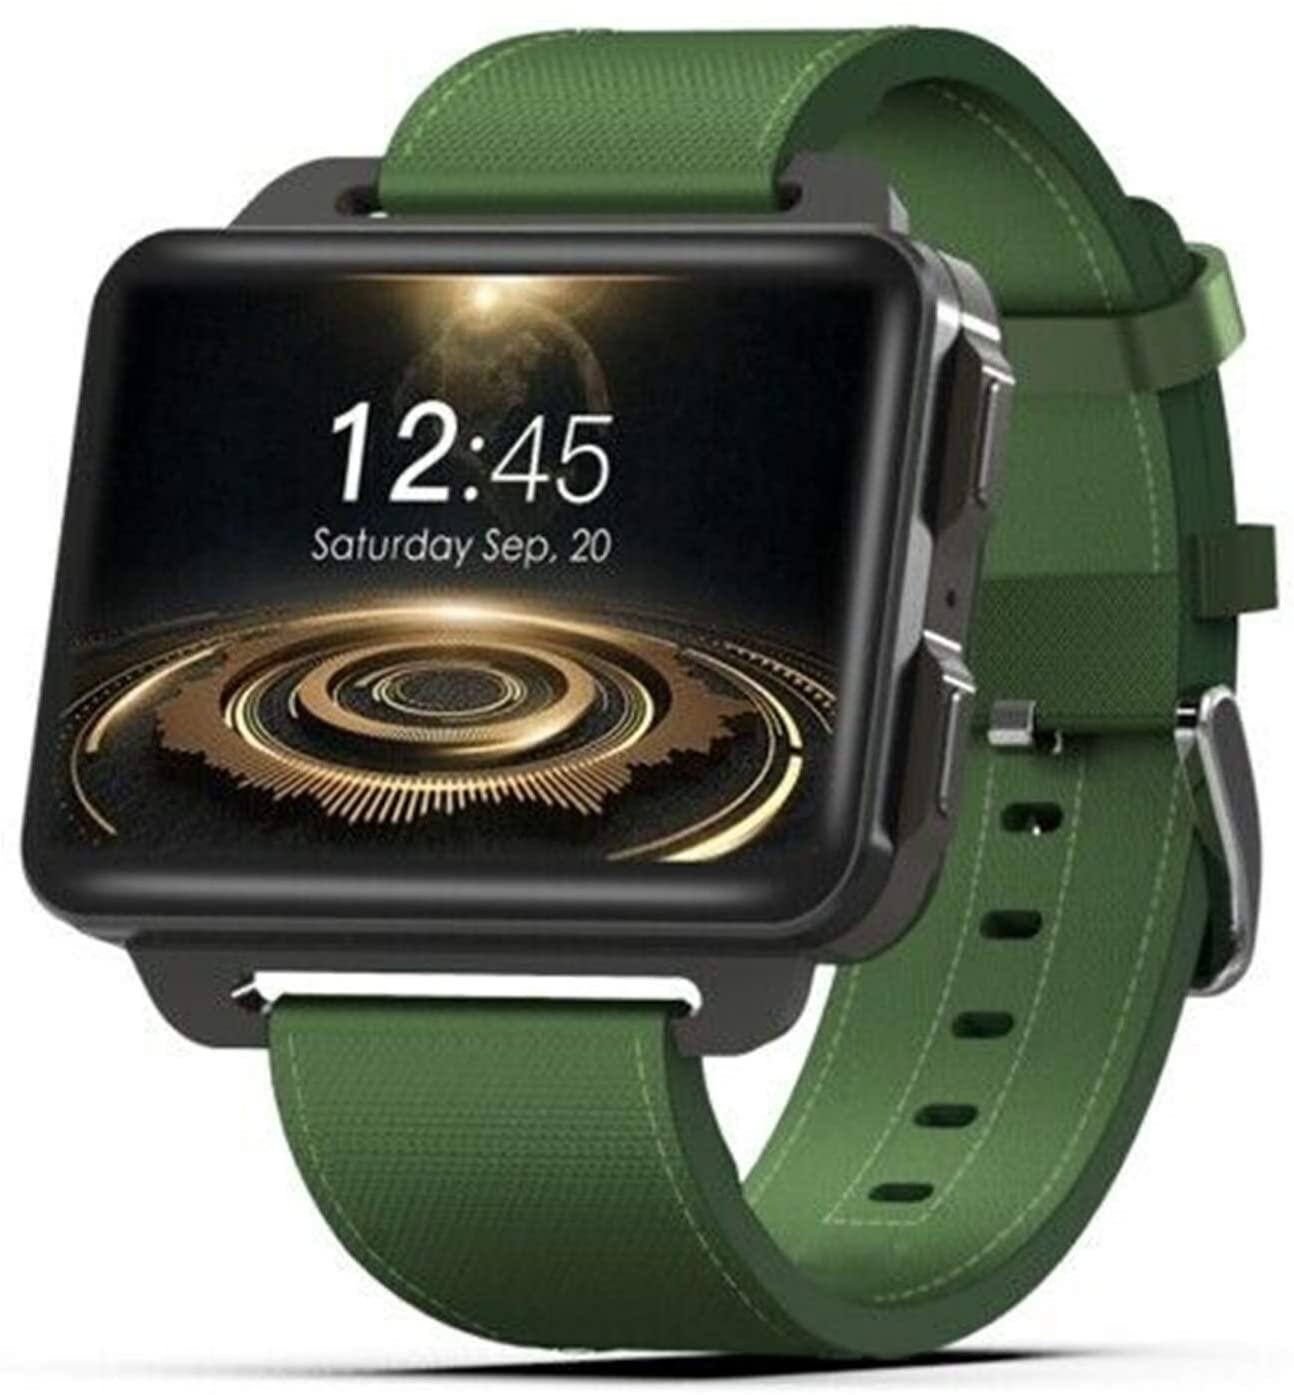 DM99 Bluetooth Smart Watch 2.2 inch Android OS 3G Smartwatch Phone DM99 Android Smart Watch Phone 1GB 16GB 1200 mAh Battery 130W Camera GPS WiFi SIM MP4 (Green)